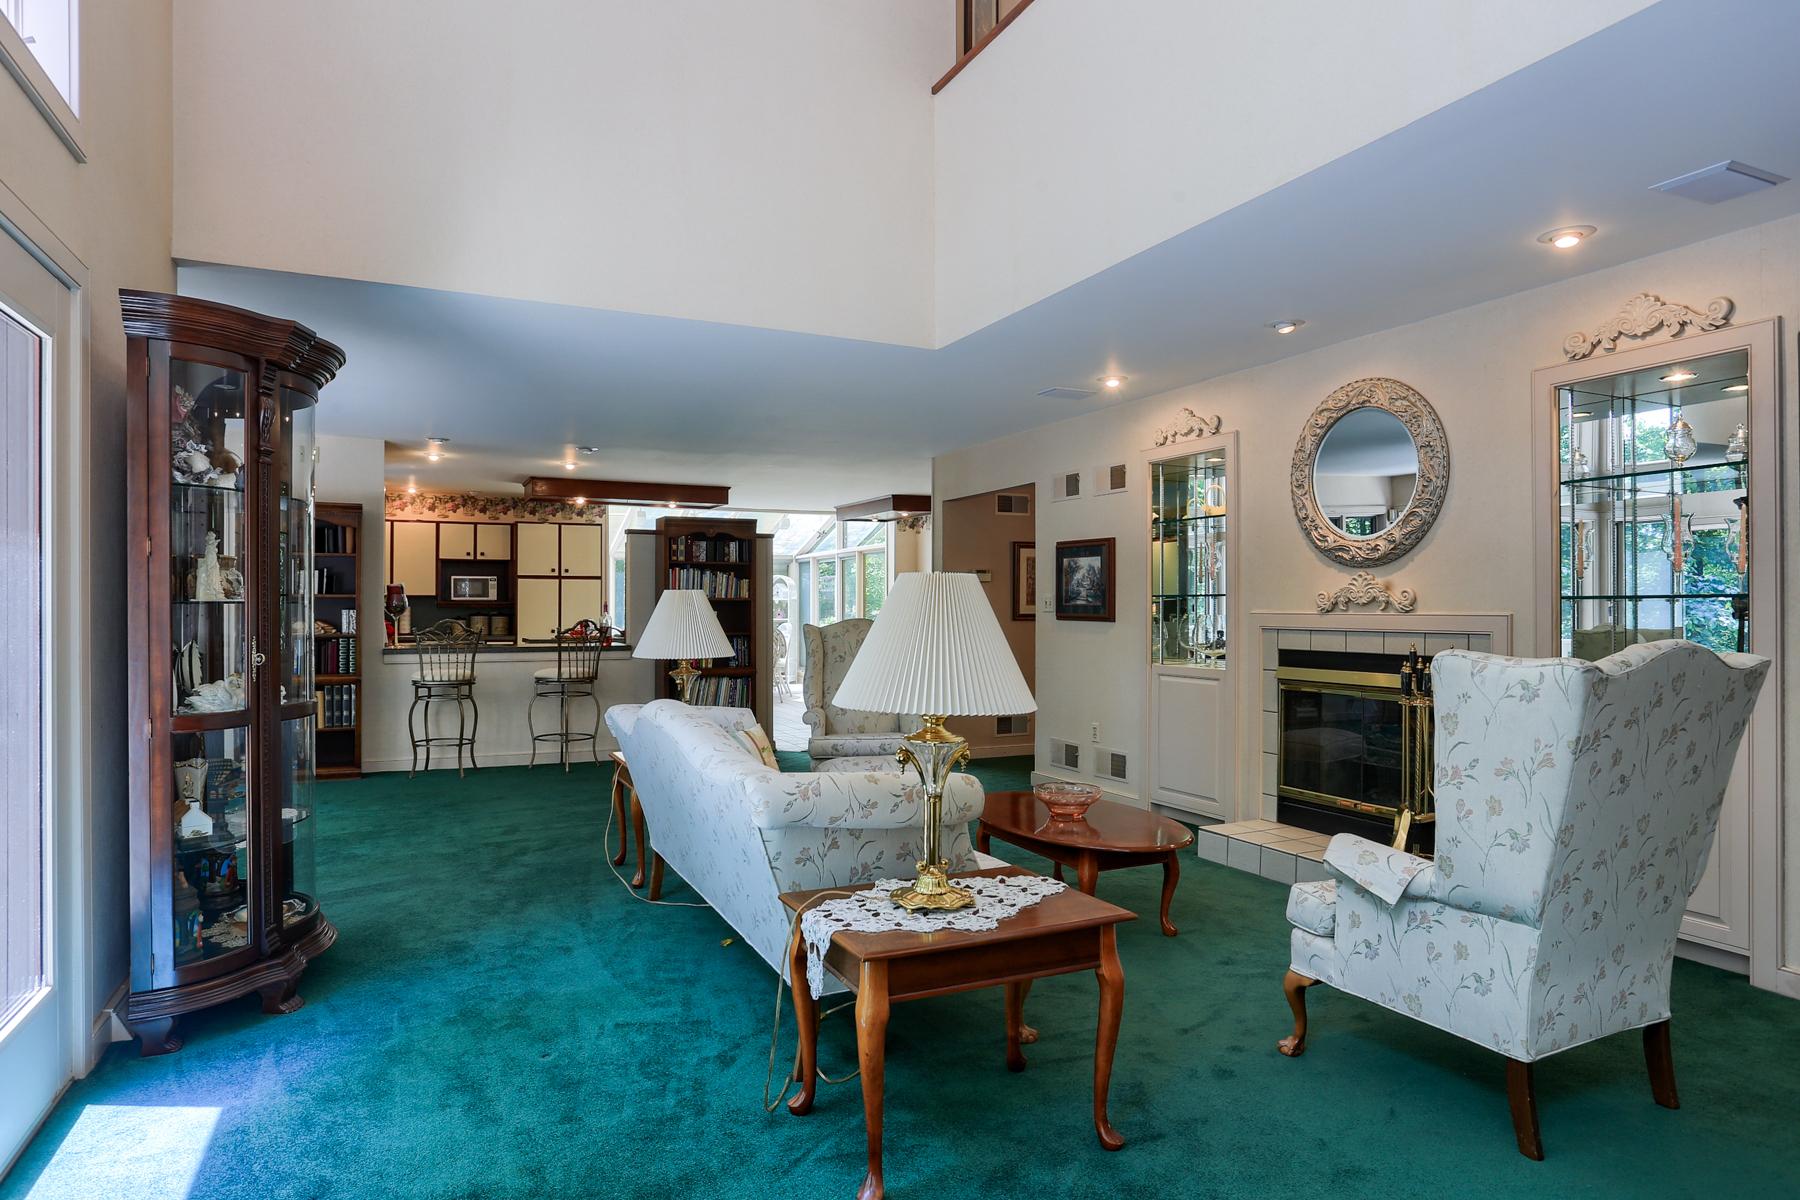 Additional photo for property listing at 1265 Ash Lane  莱巴嫩, 宾夕法尼亚州 17042 美国